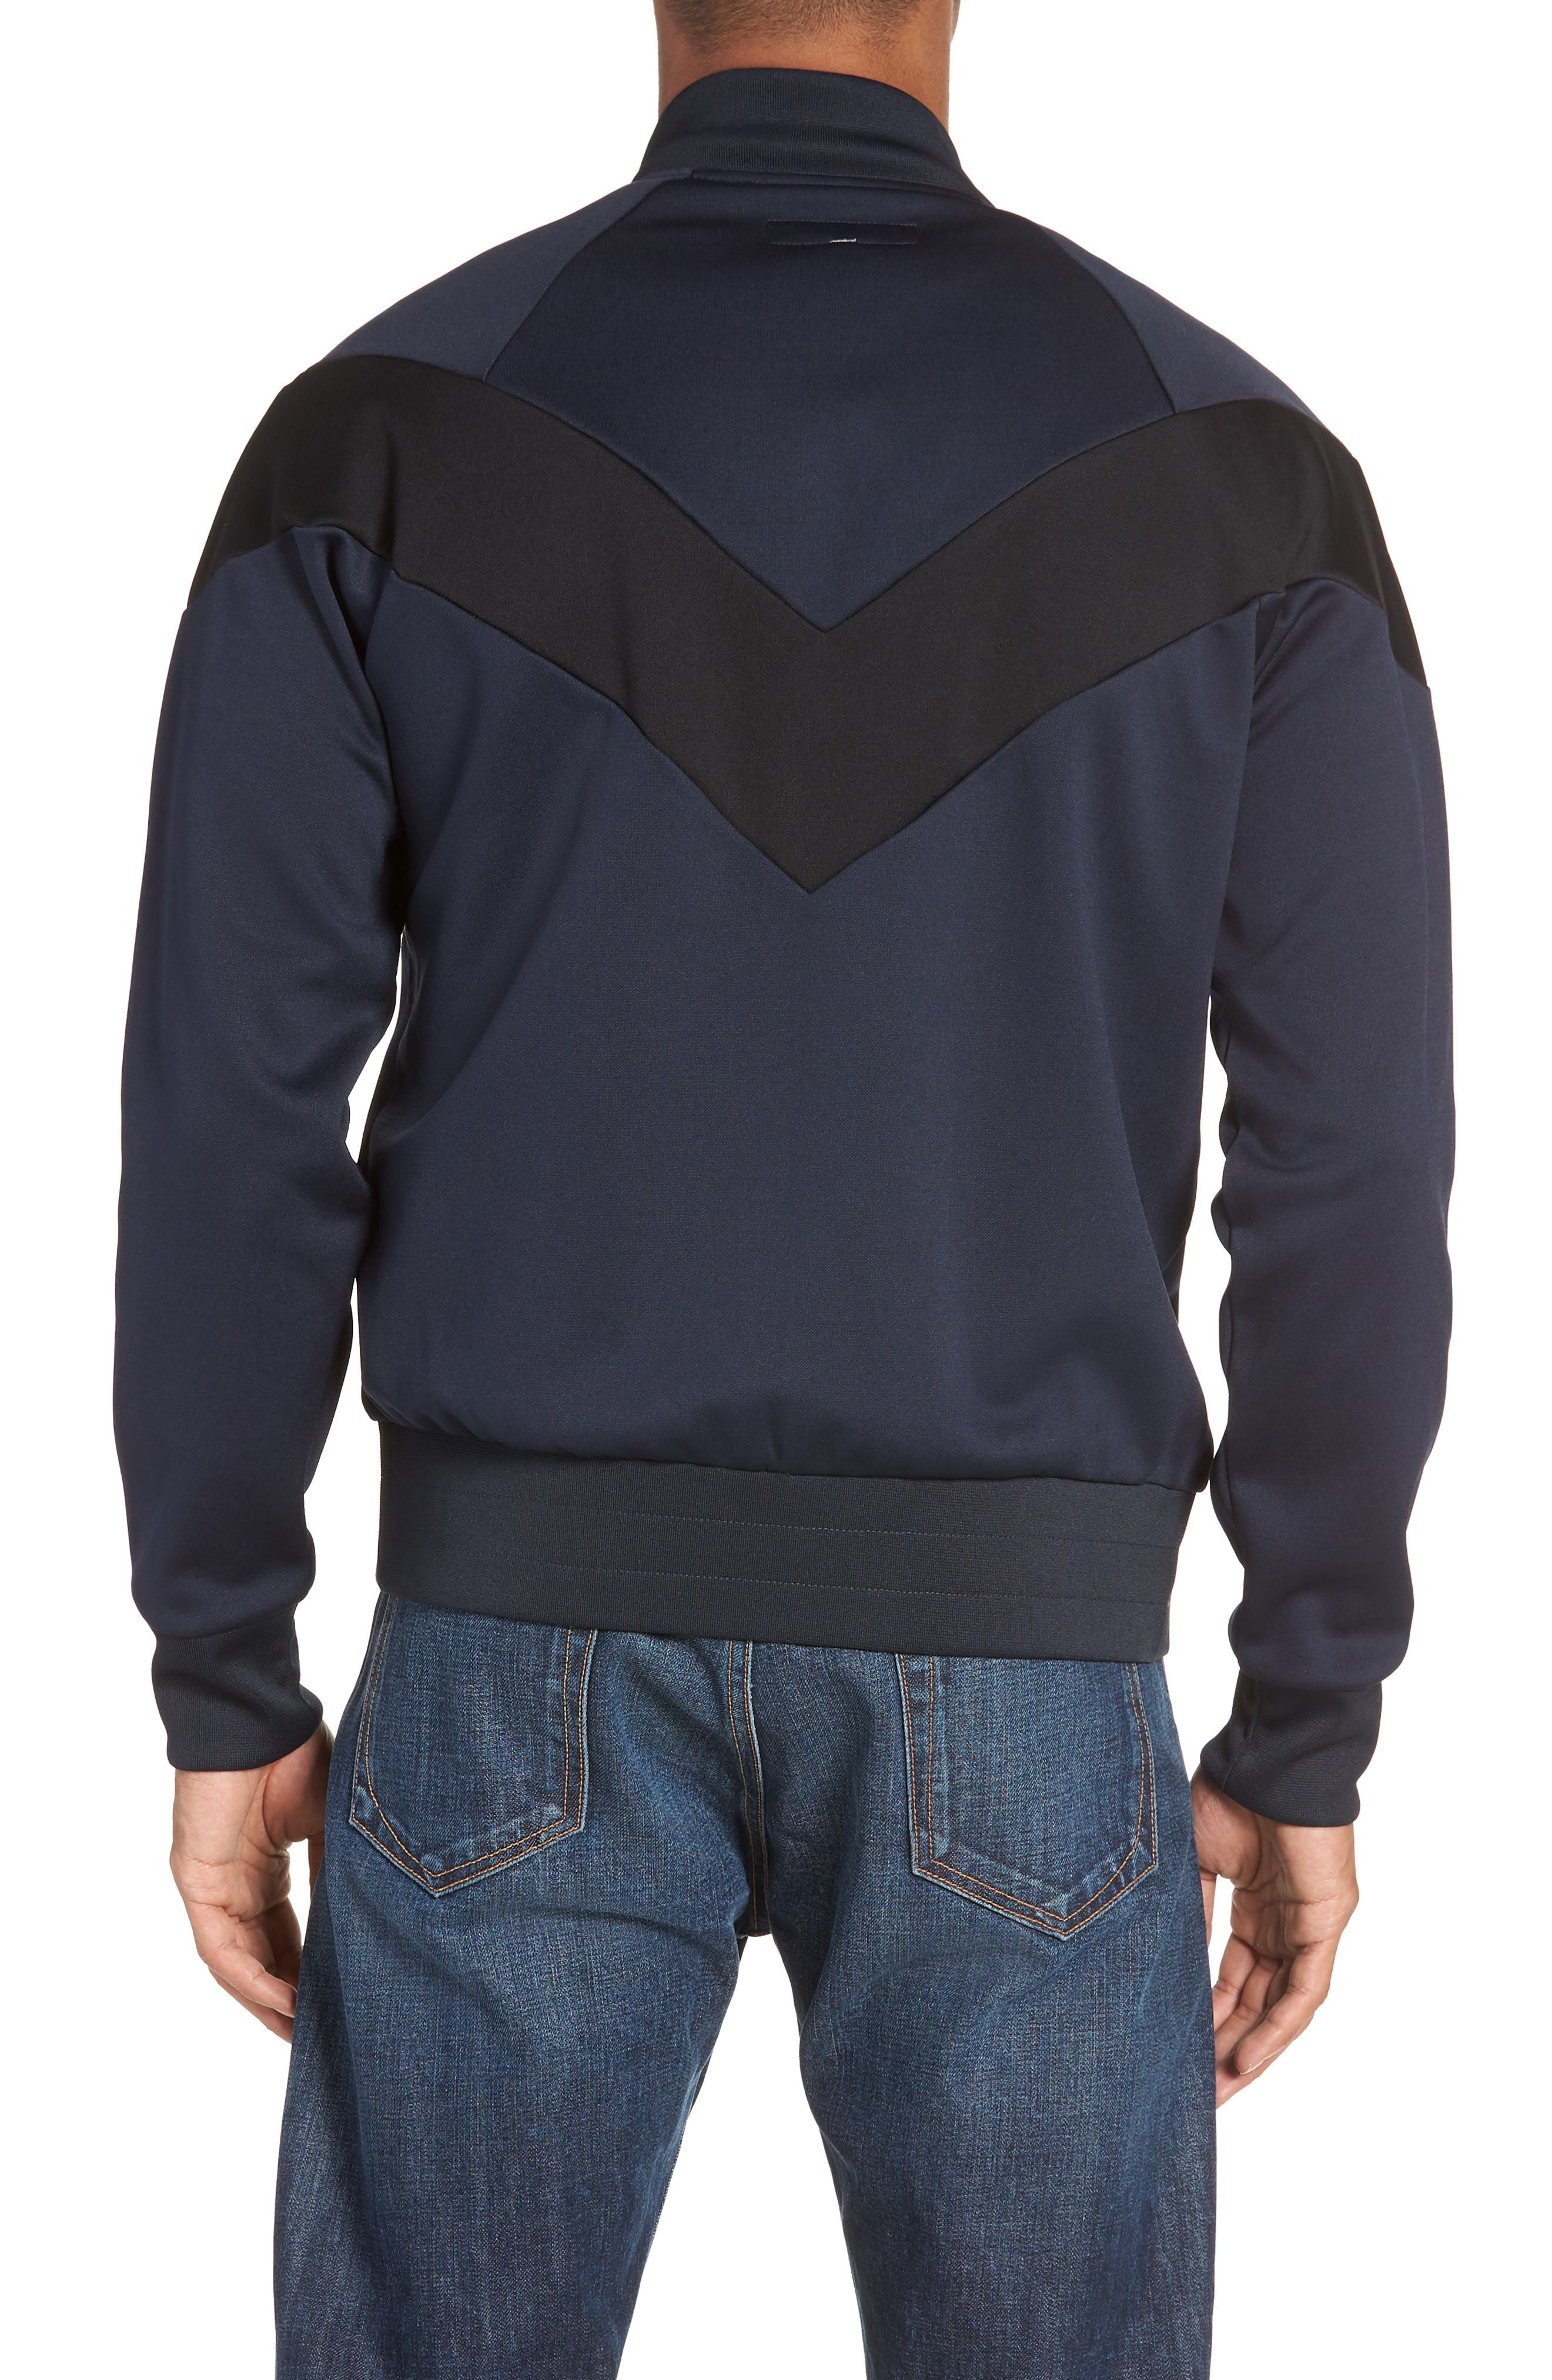 Colorblock Slim Fit Bomber Jacket,                             Alternate thumbnail 2, color,                             NAVY/ BLACK